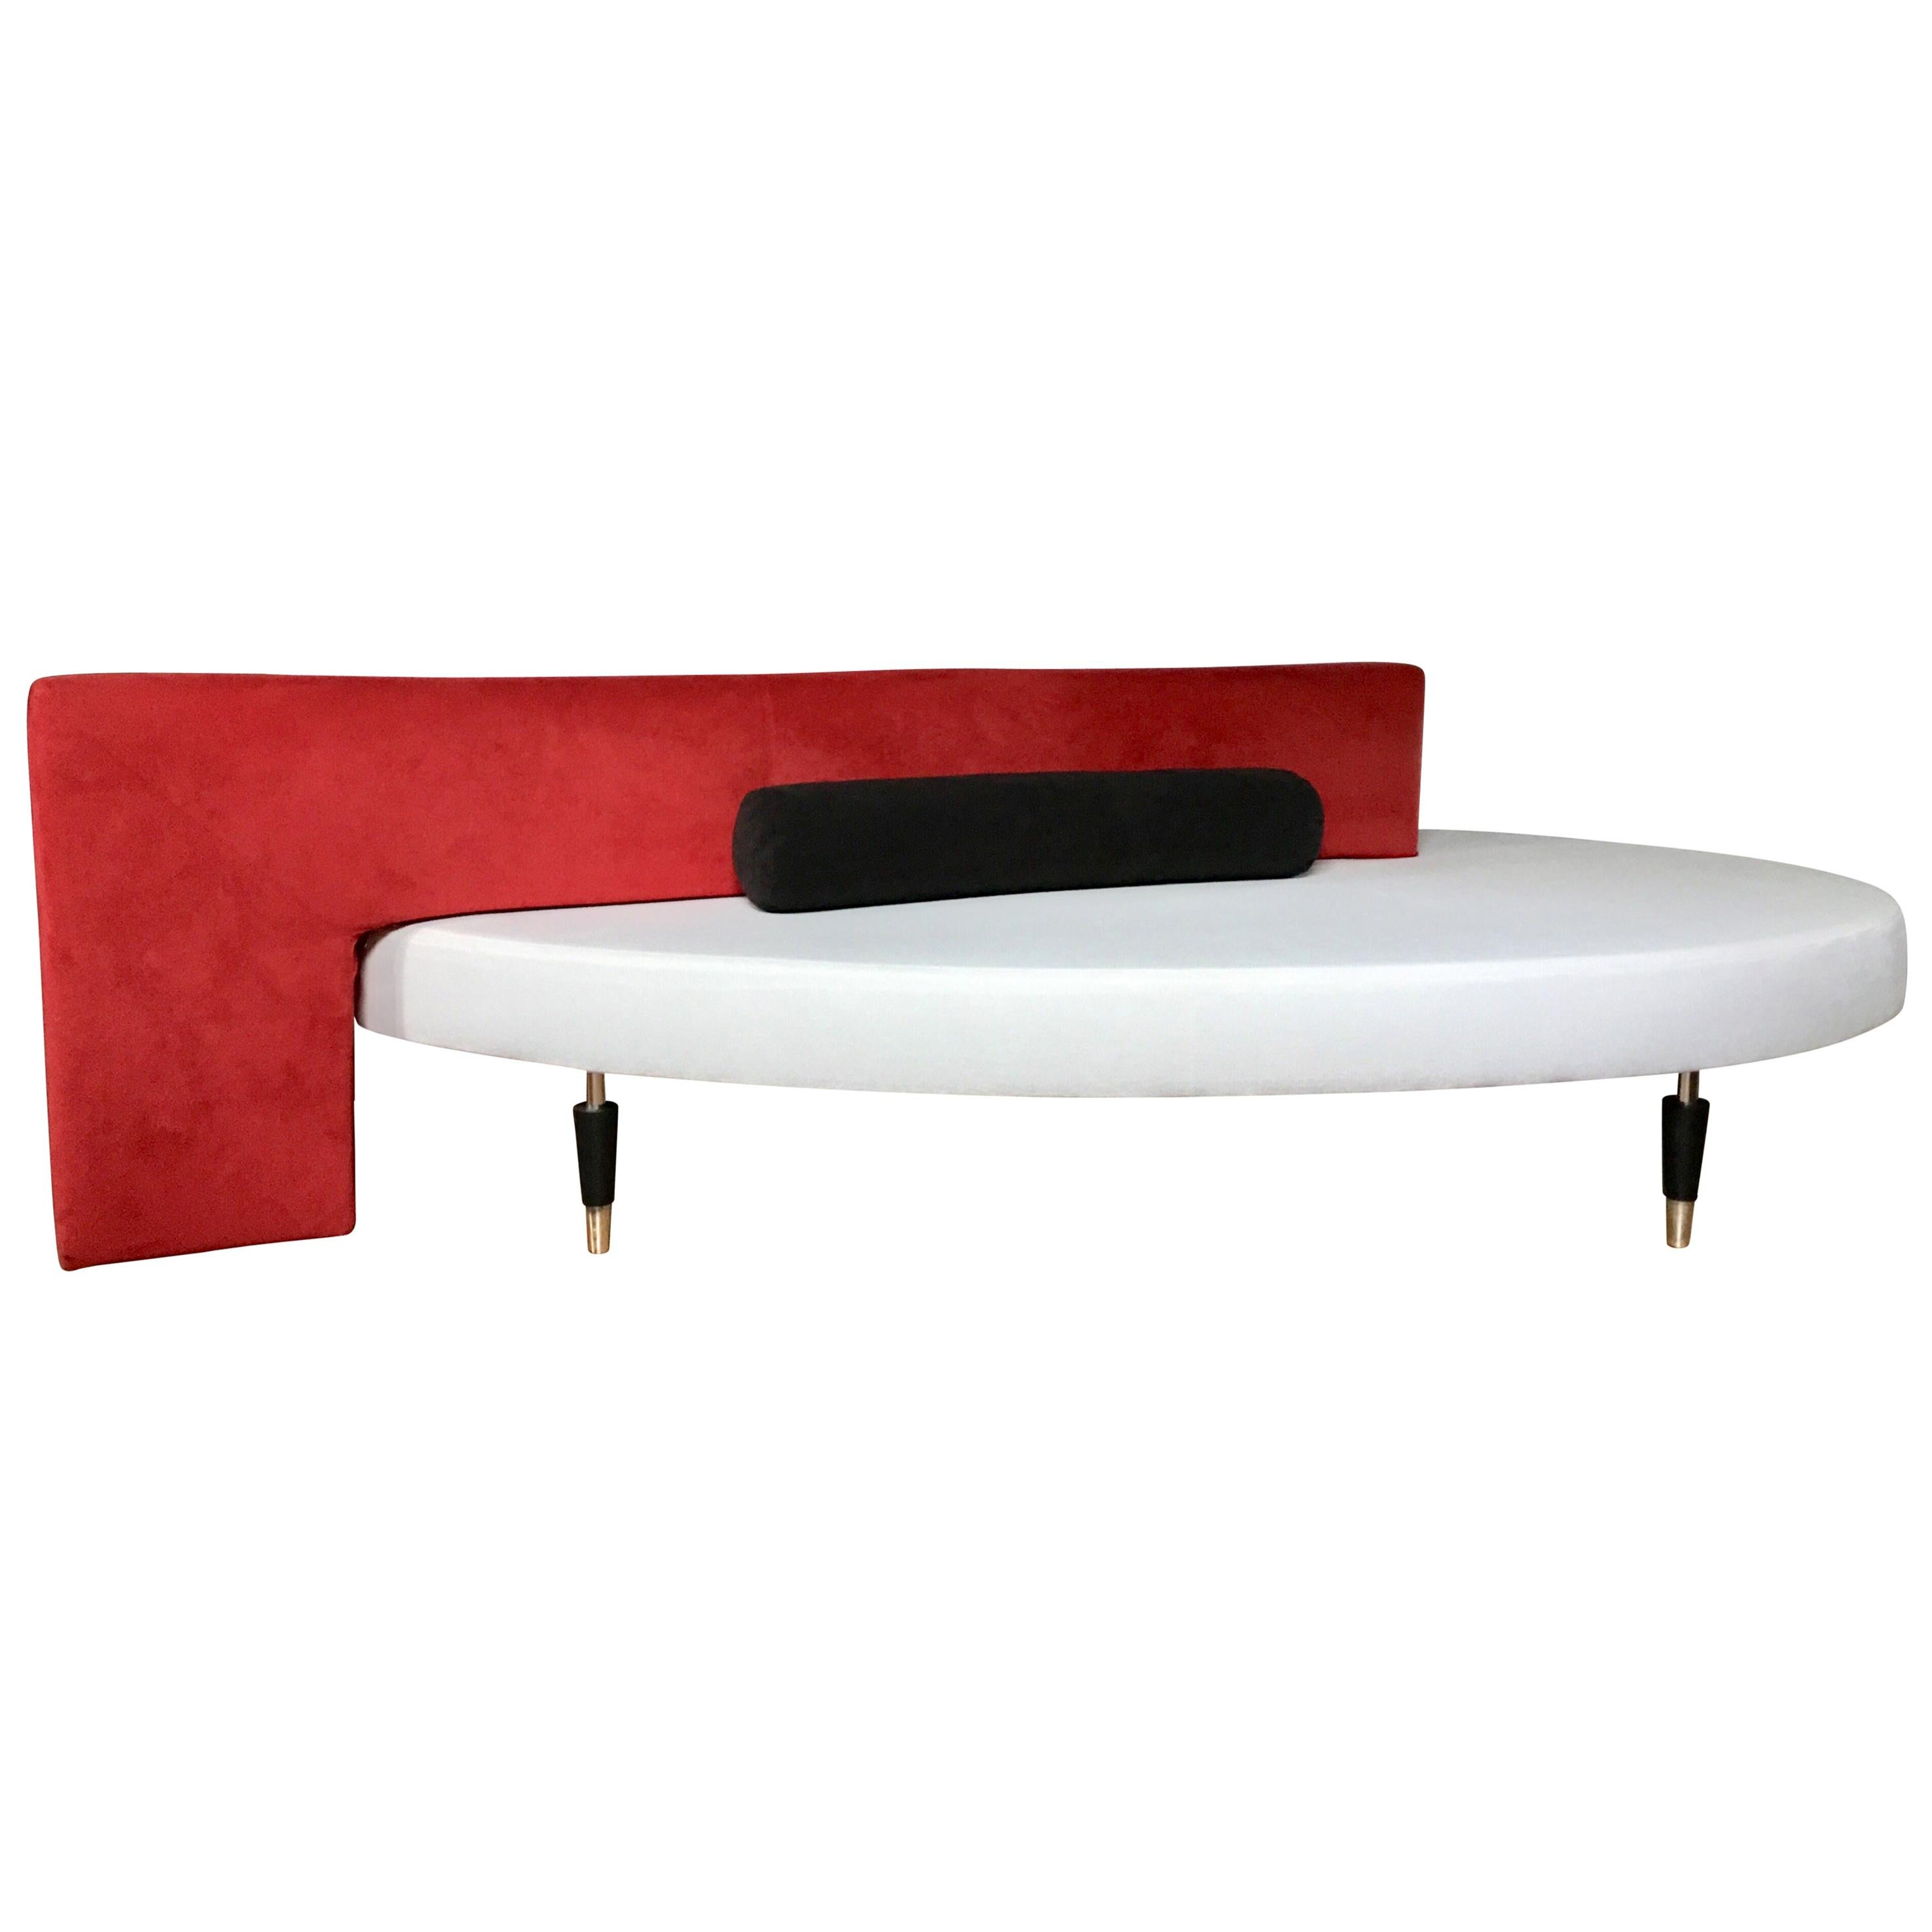 B&B Italia Modern Memphis Style Sculptural Sofa Chaise Bench, Paolo Piva, Italy